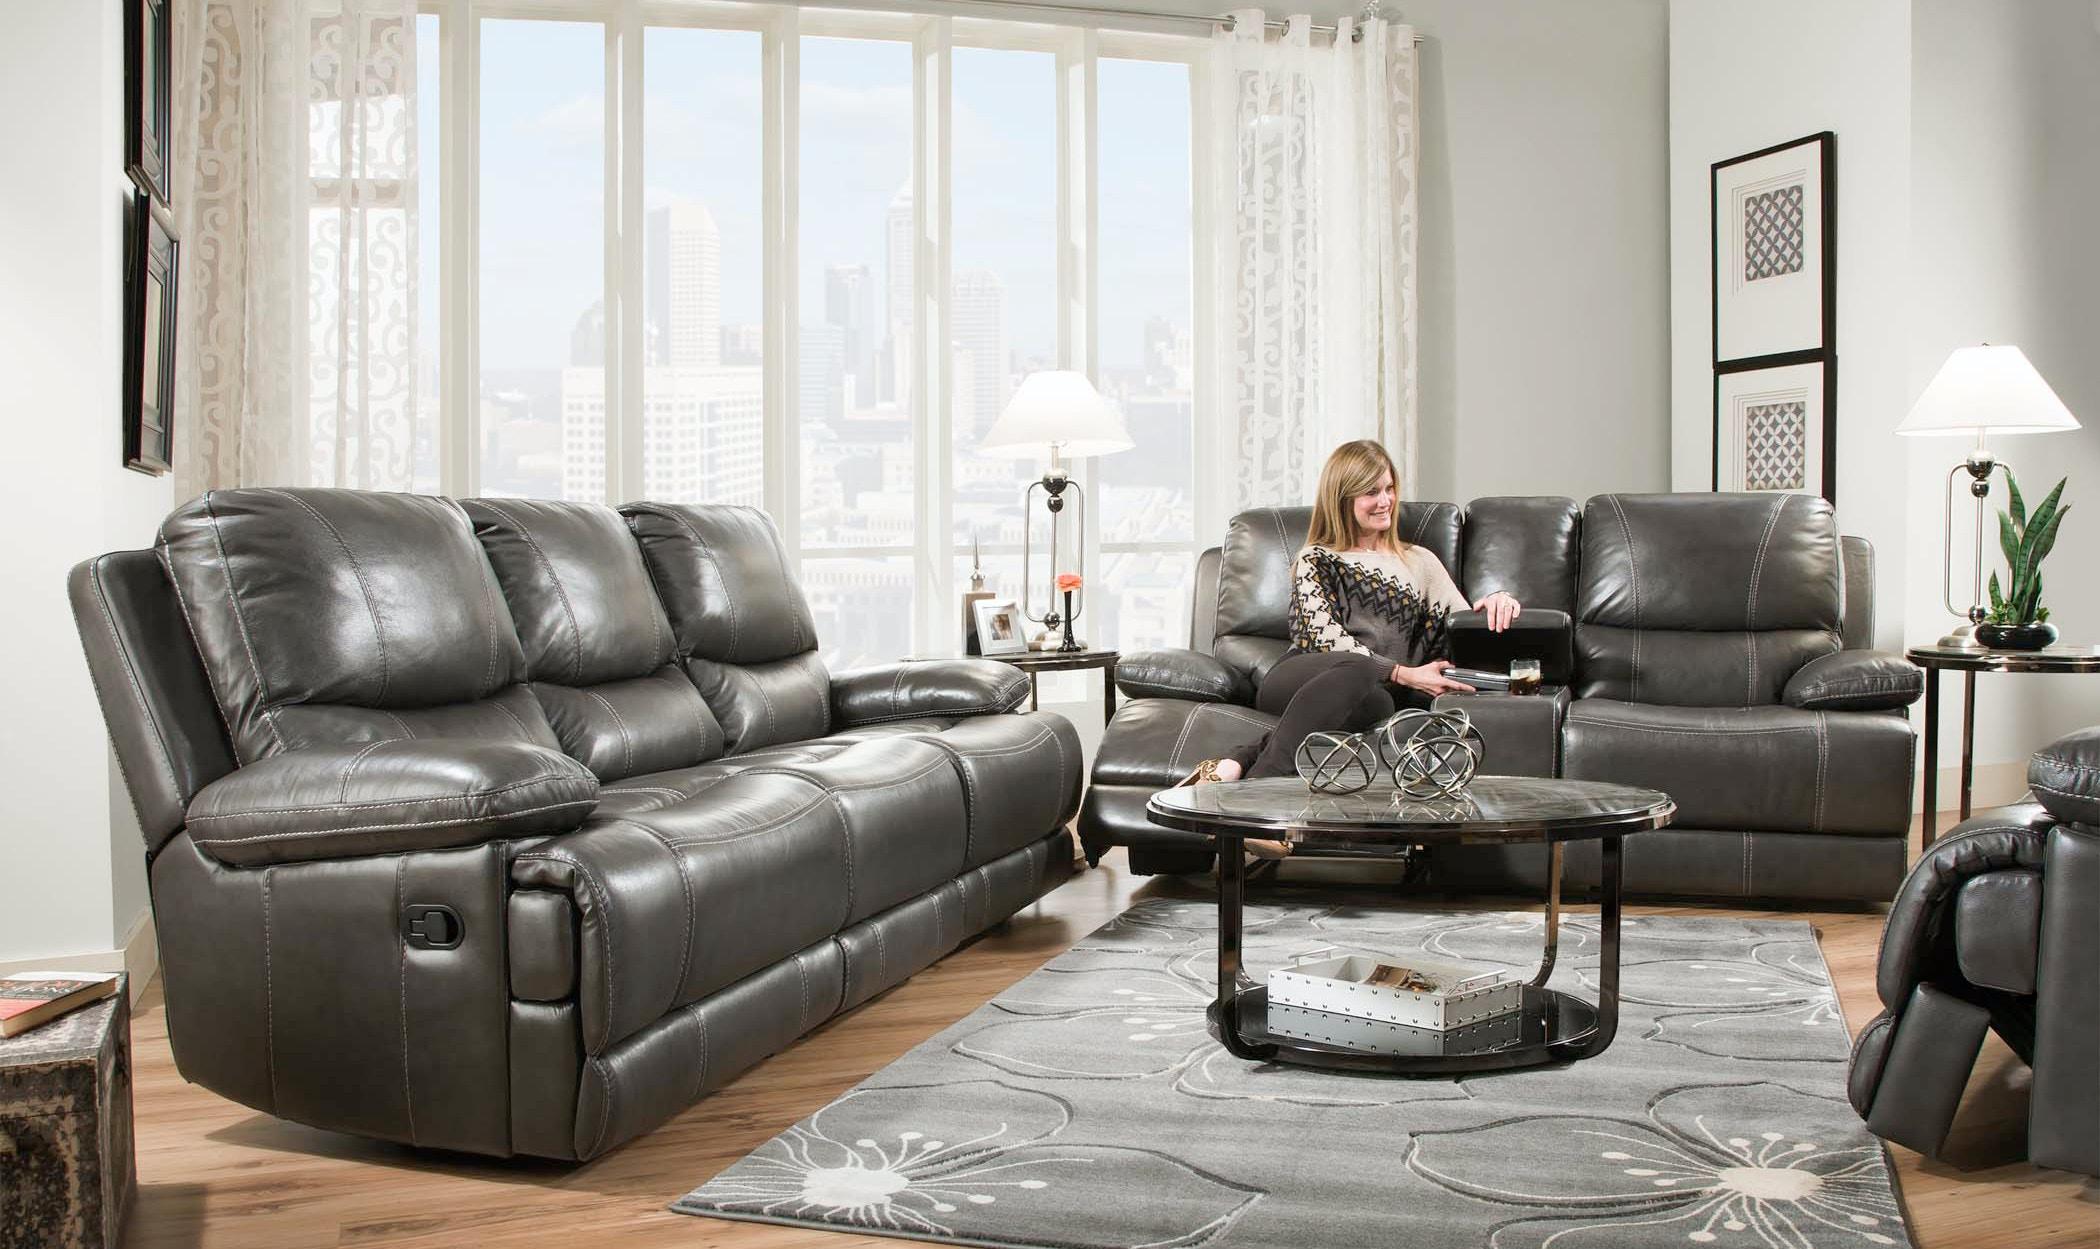 Corinthian Brooklyn Power Reclining Sofa 056158